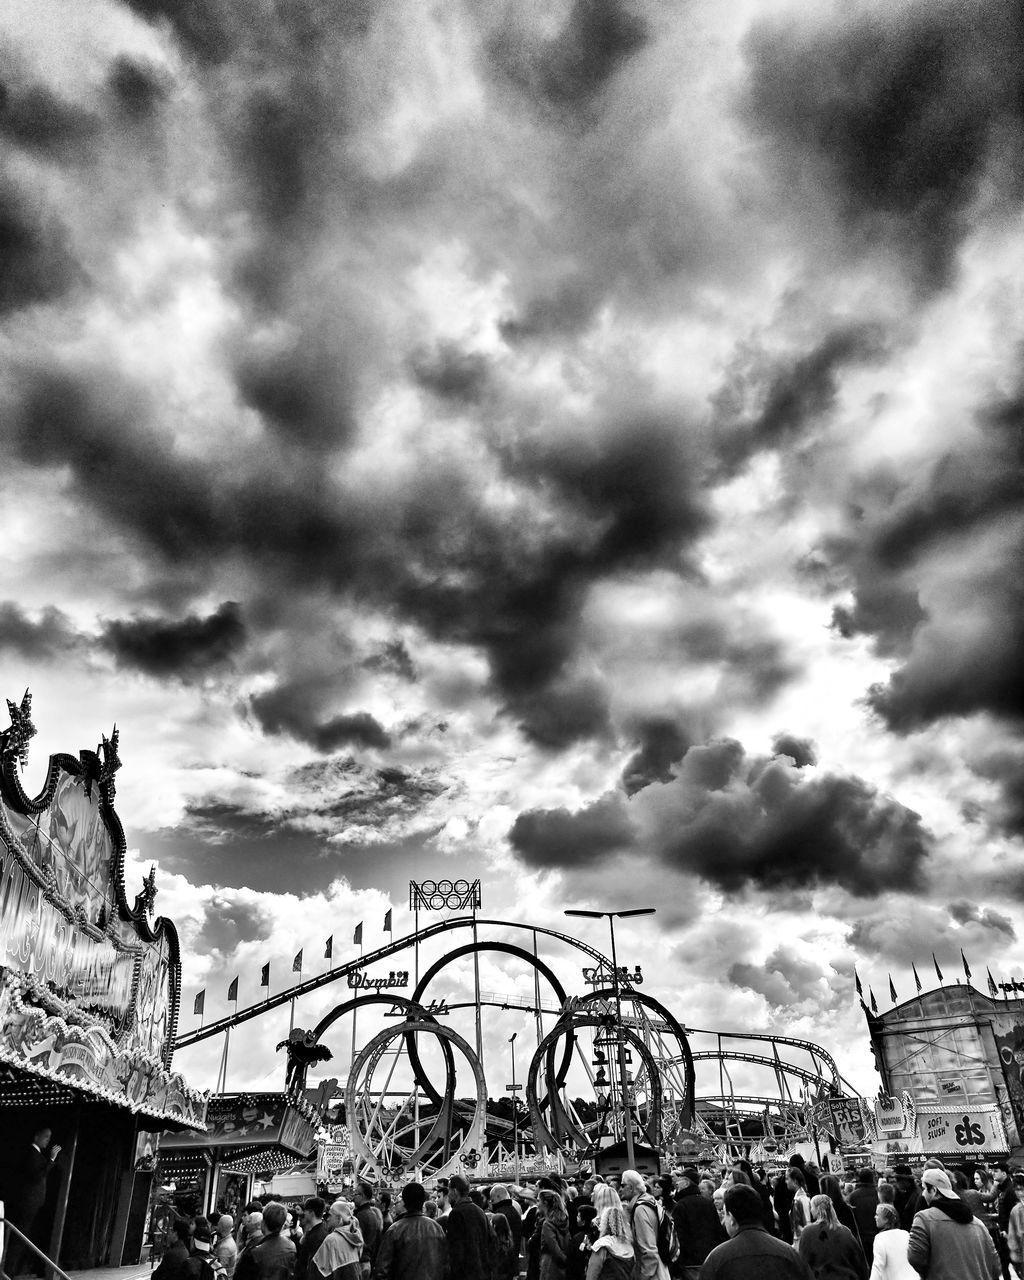 large group of people, amusement park, cloud - sky, sky, arts culture and entertainment, leisure activity, amusement park ride, real people, fun, outdoors, enjoyment, women, day, crowd, men, built structure, carousel, nature, people